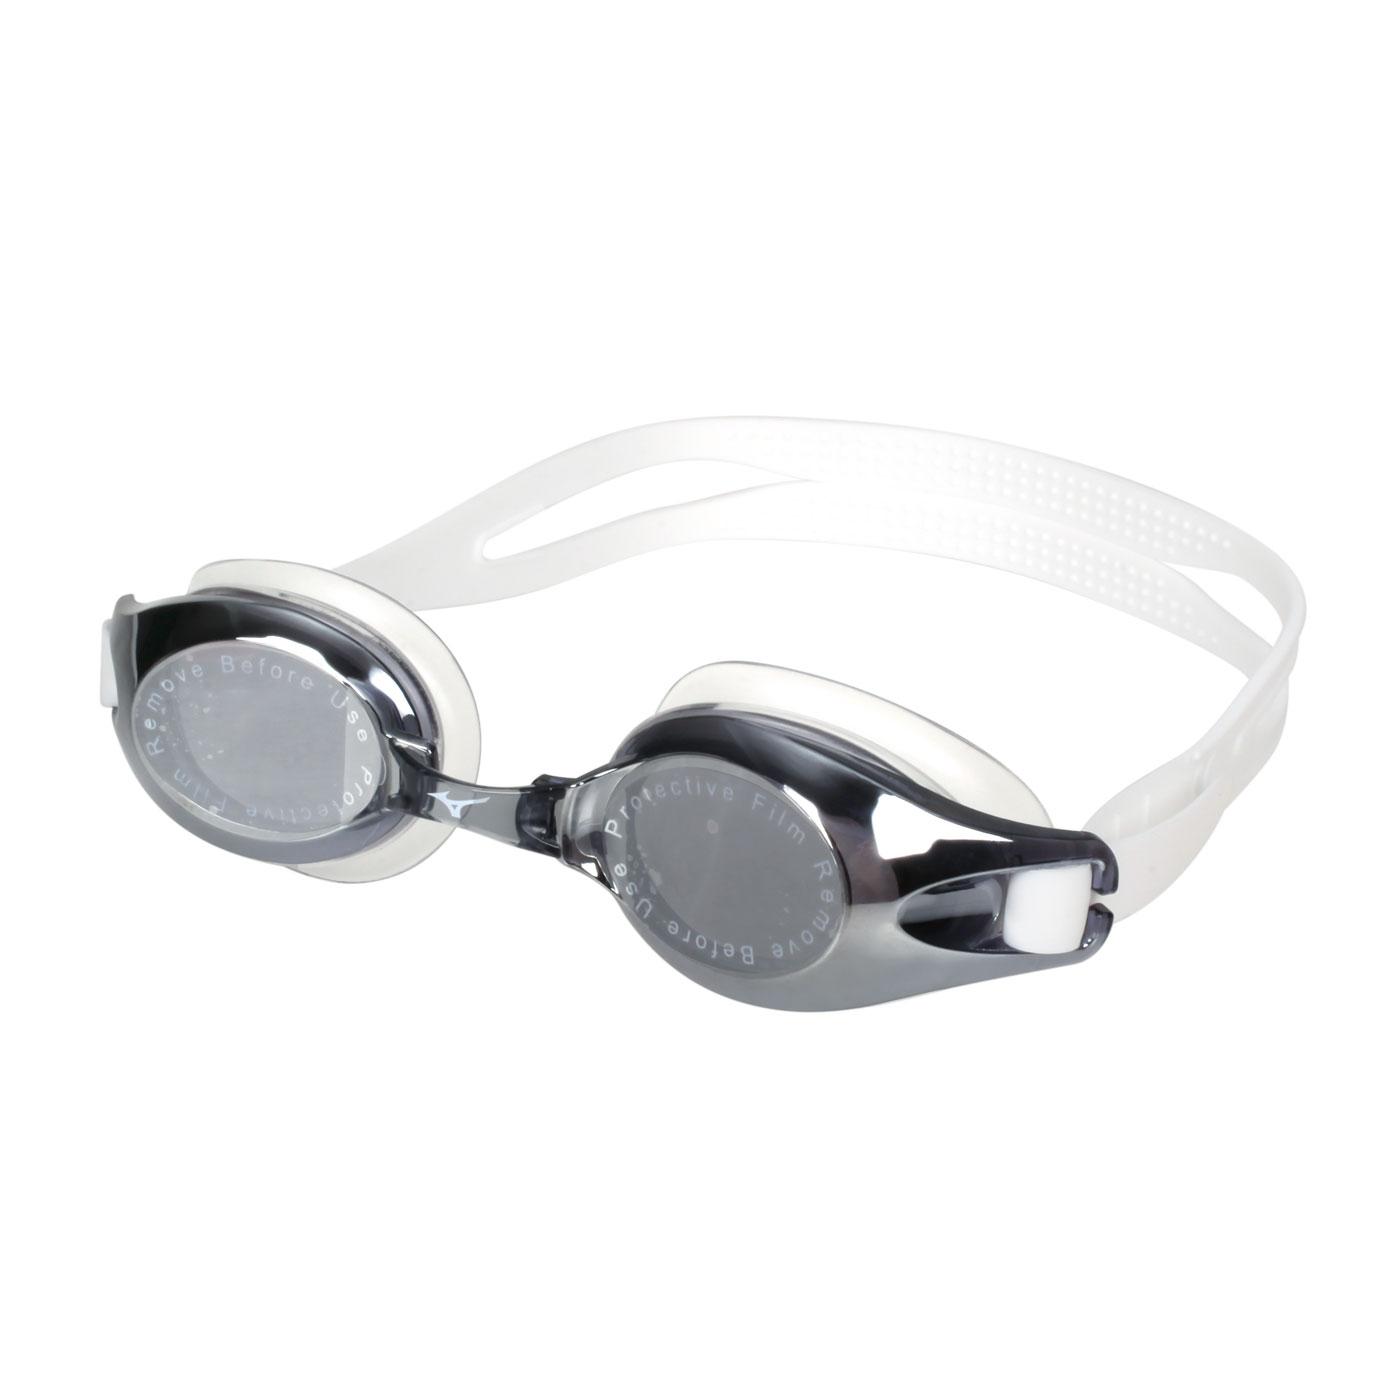 MIZUNO 泳鏡  SWIMN3TE702100-91 - 灰白